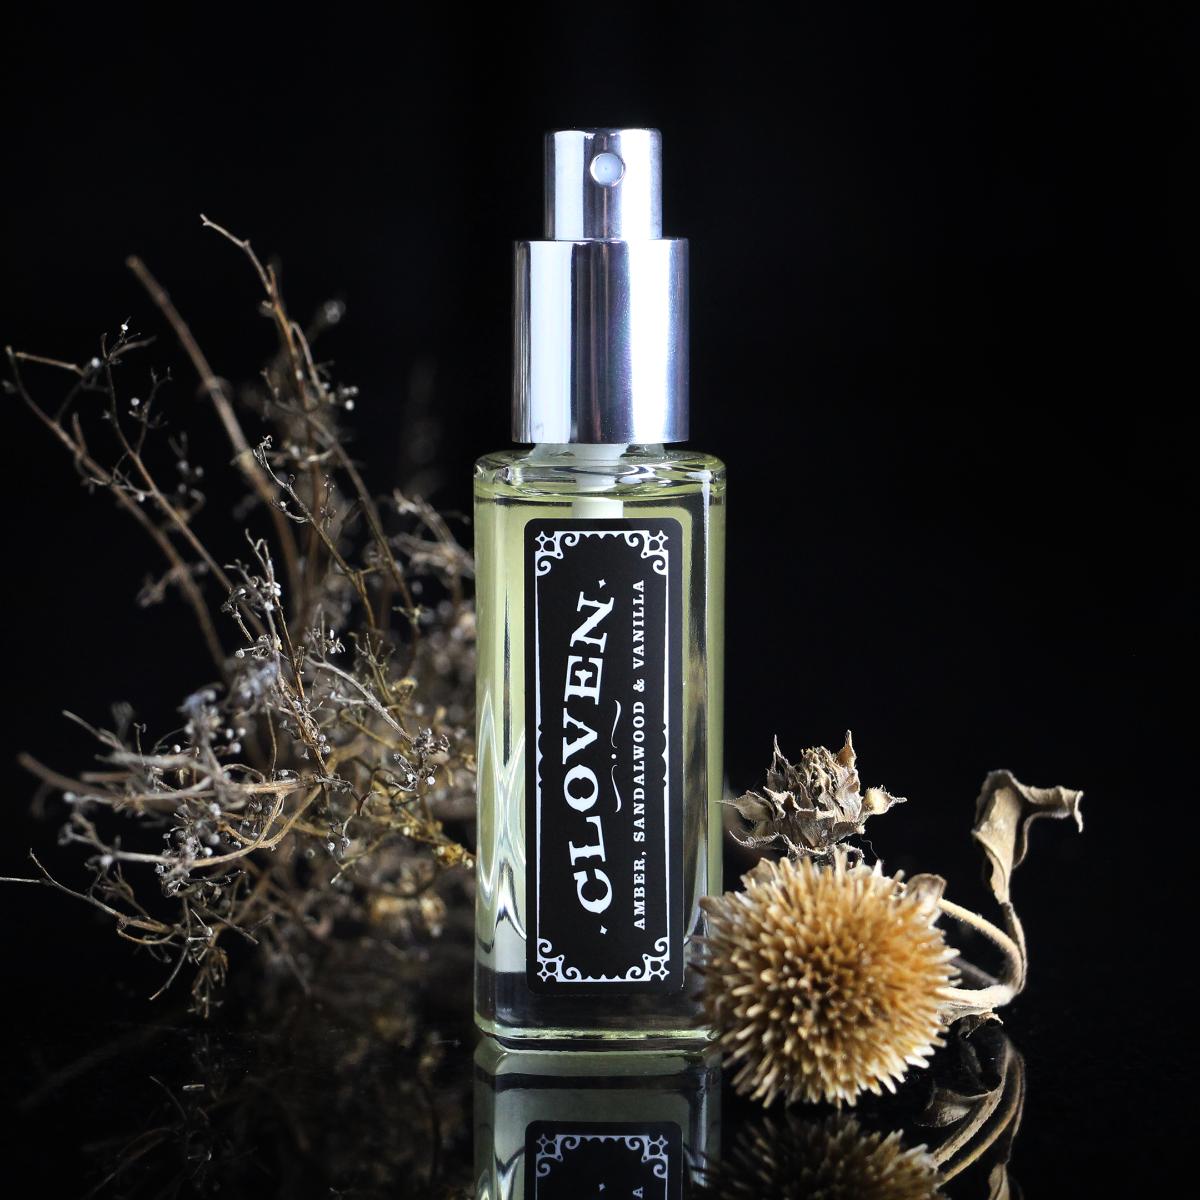 Madame Scodioli Cloven Perfume Spray